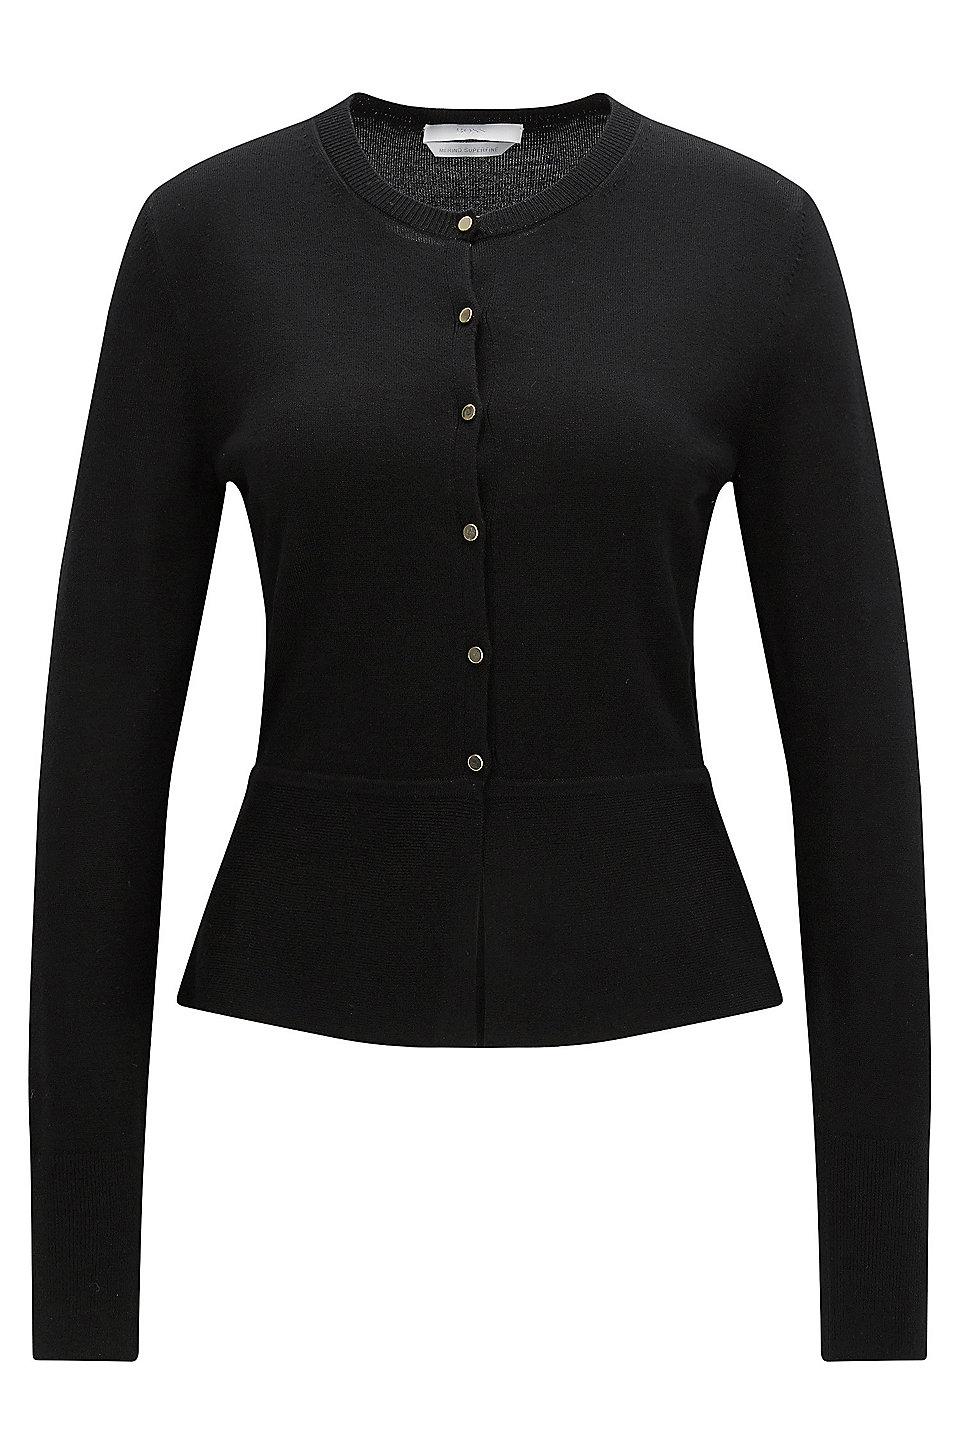 HUGO BOSS® Women's Sweaters on Sale | Free Shipping